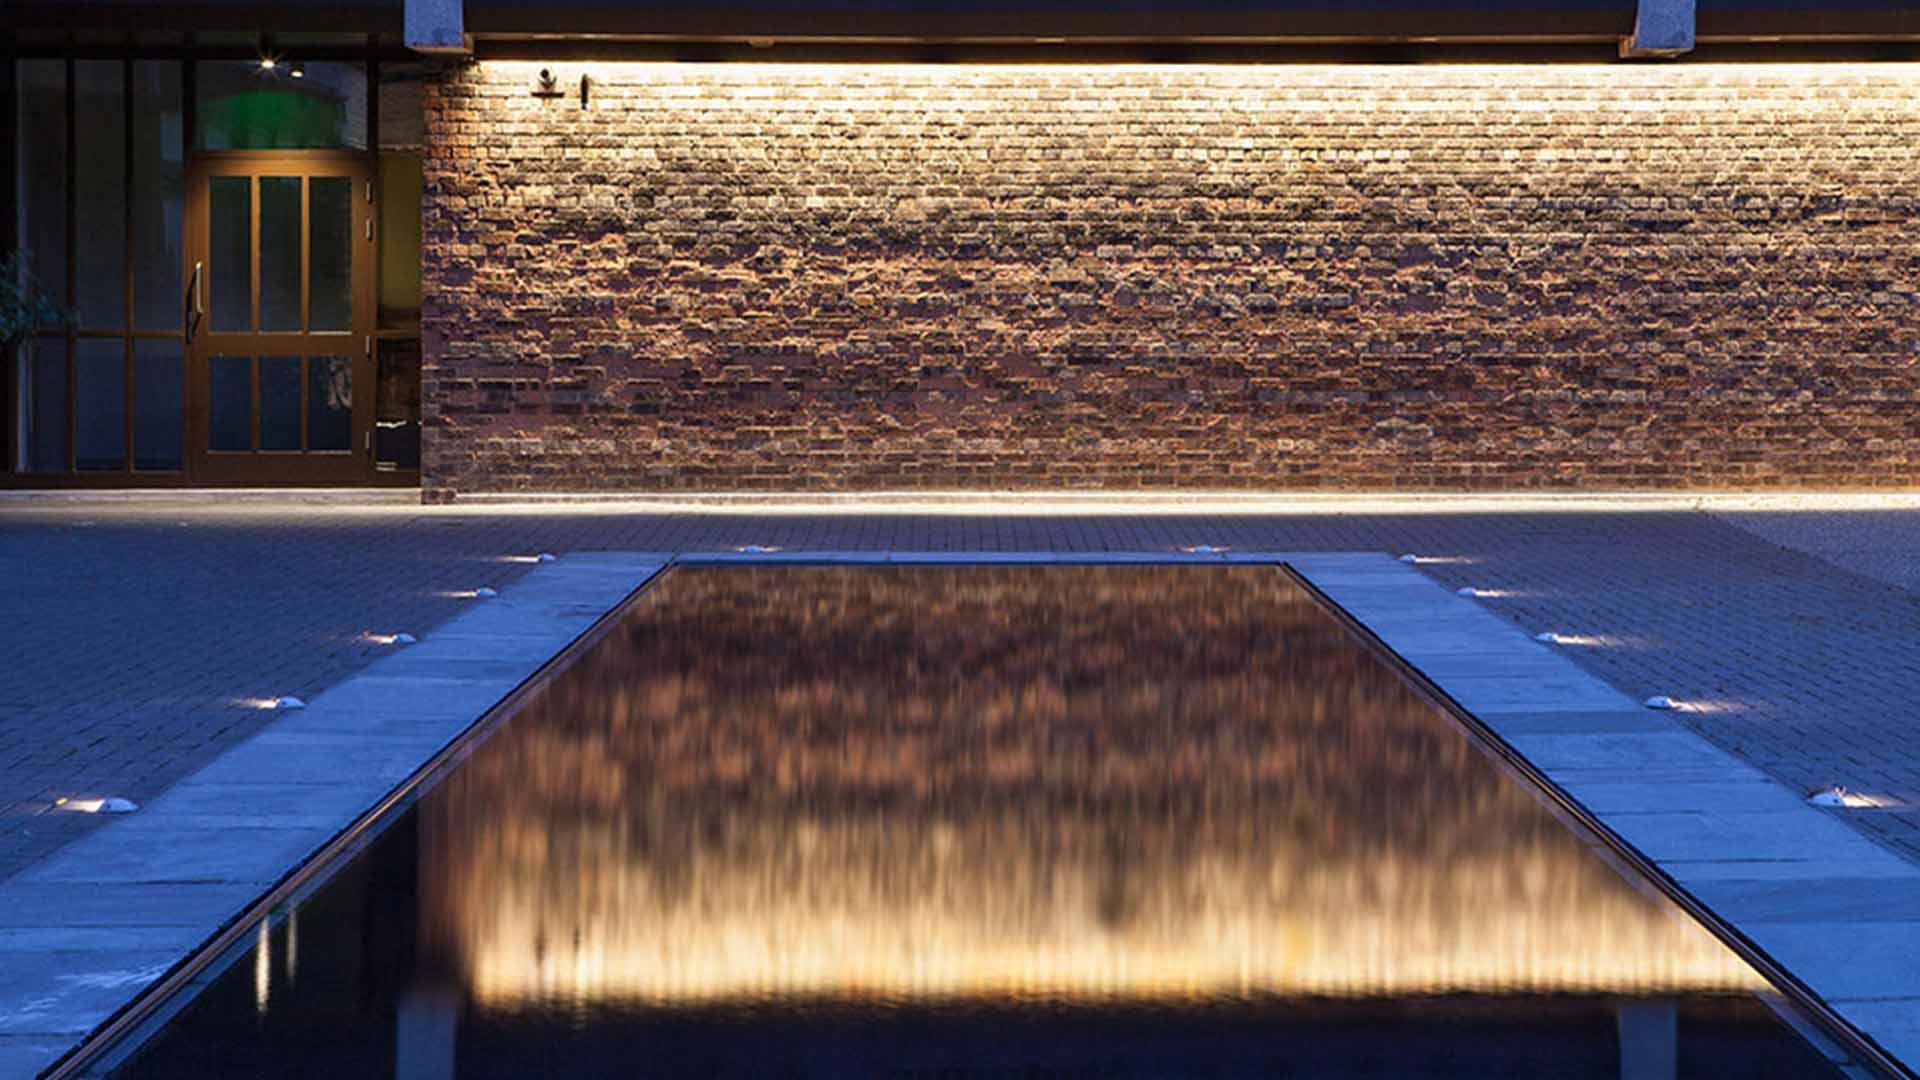 Reflection Pool Courtyard Brickwork Illumination Listed Building Nulty